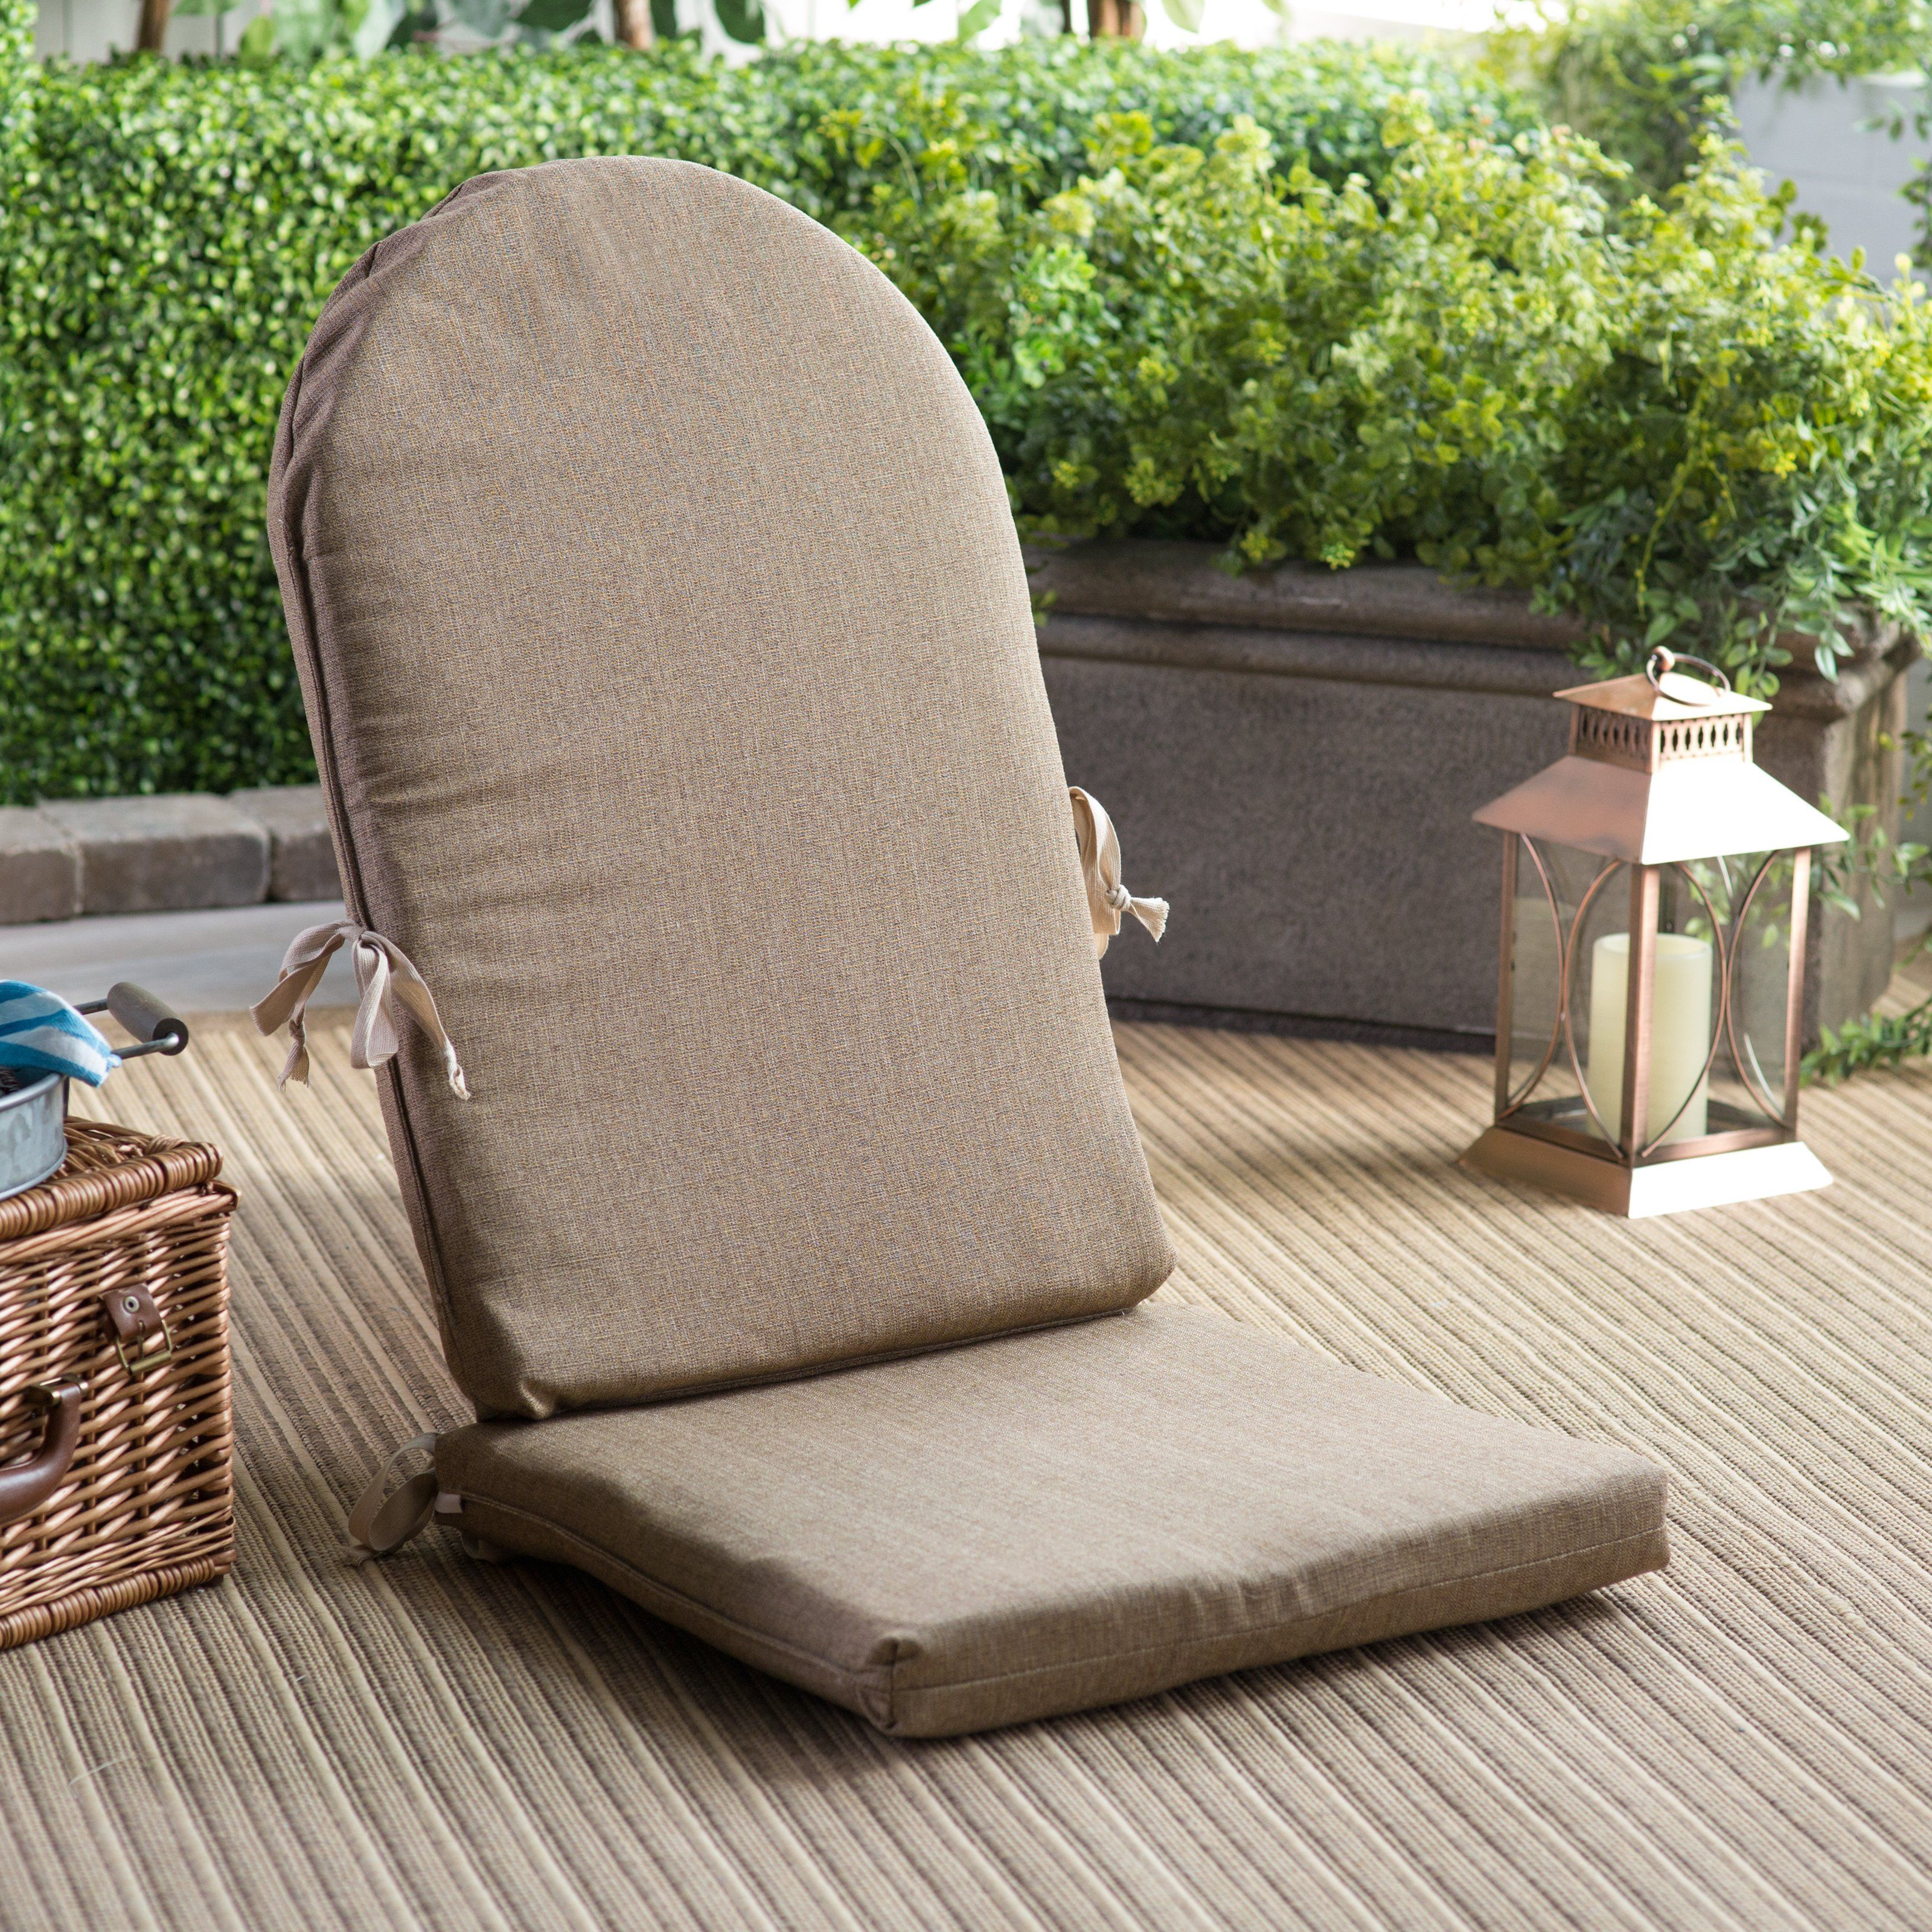 Polywood Sunbrella 46 X 20 In Adirondack Chair Cushion With